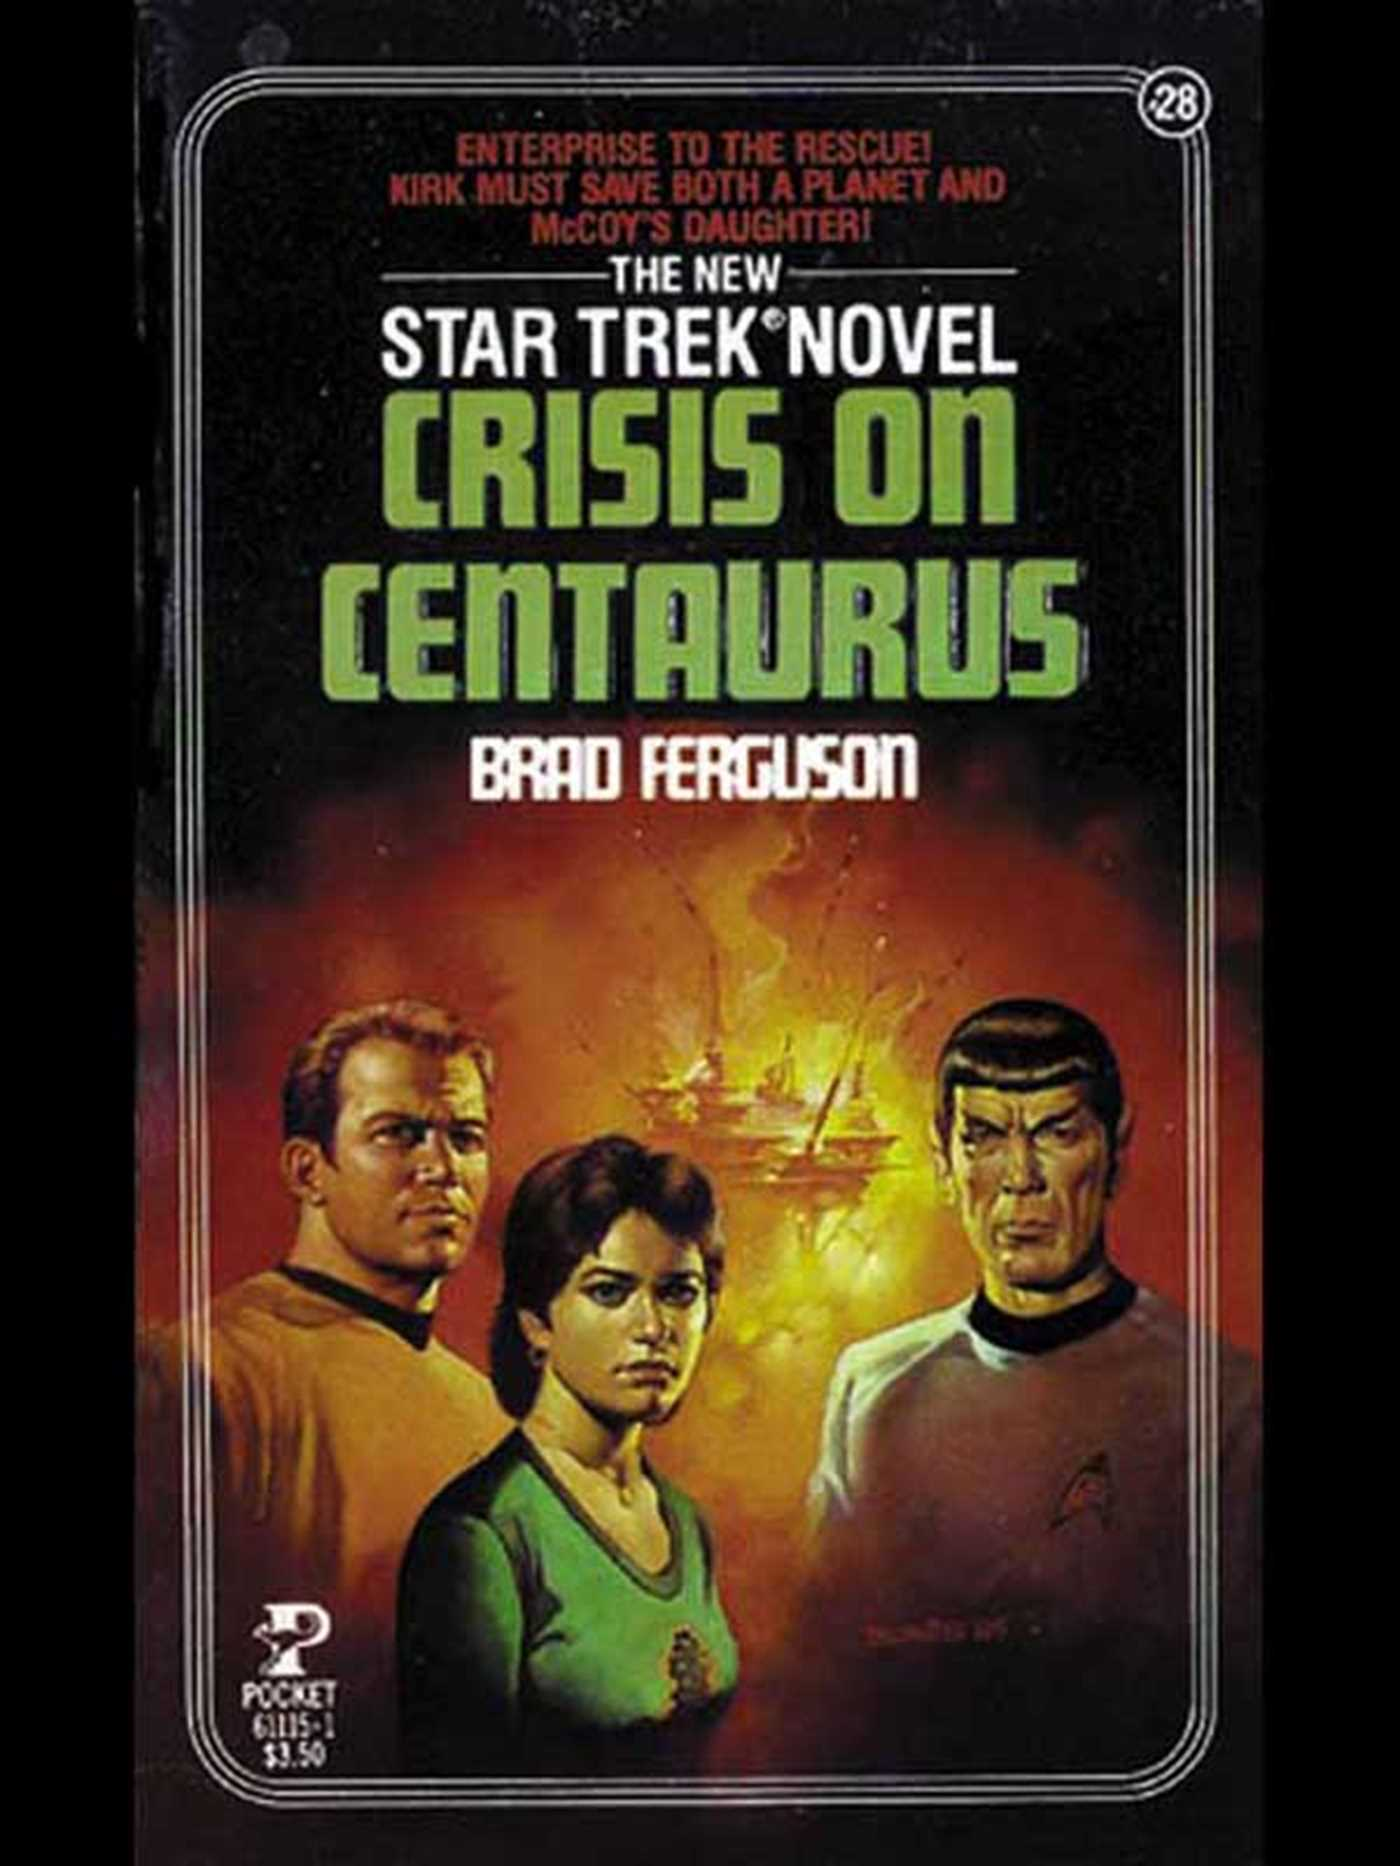 Crisis on centaurus 9780743419796 hr